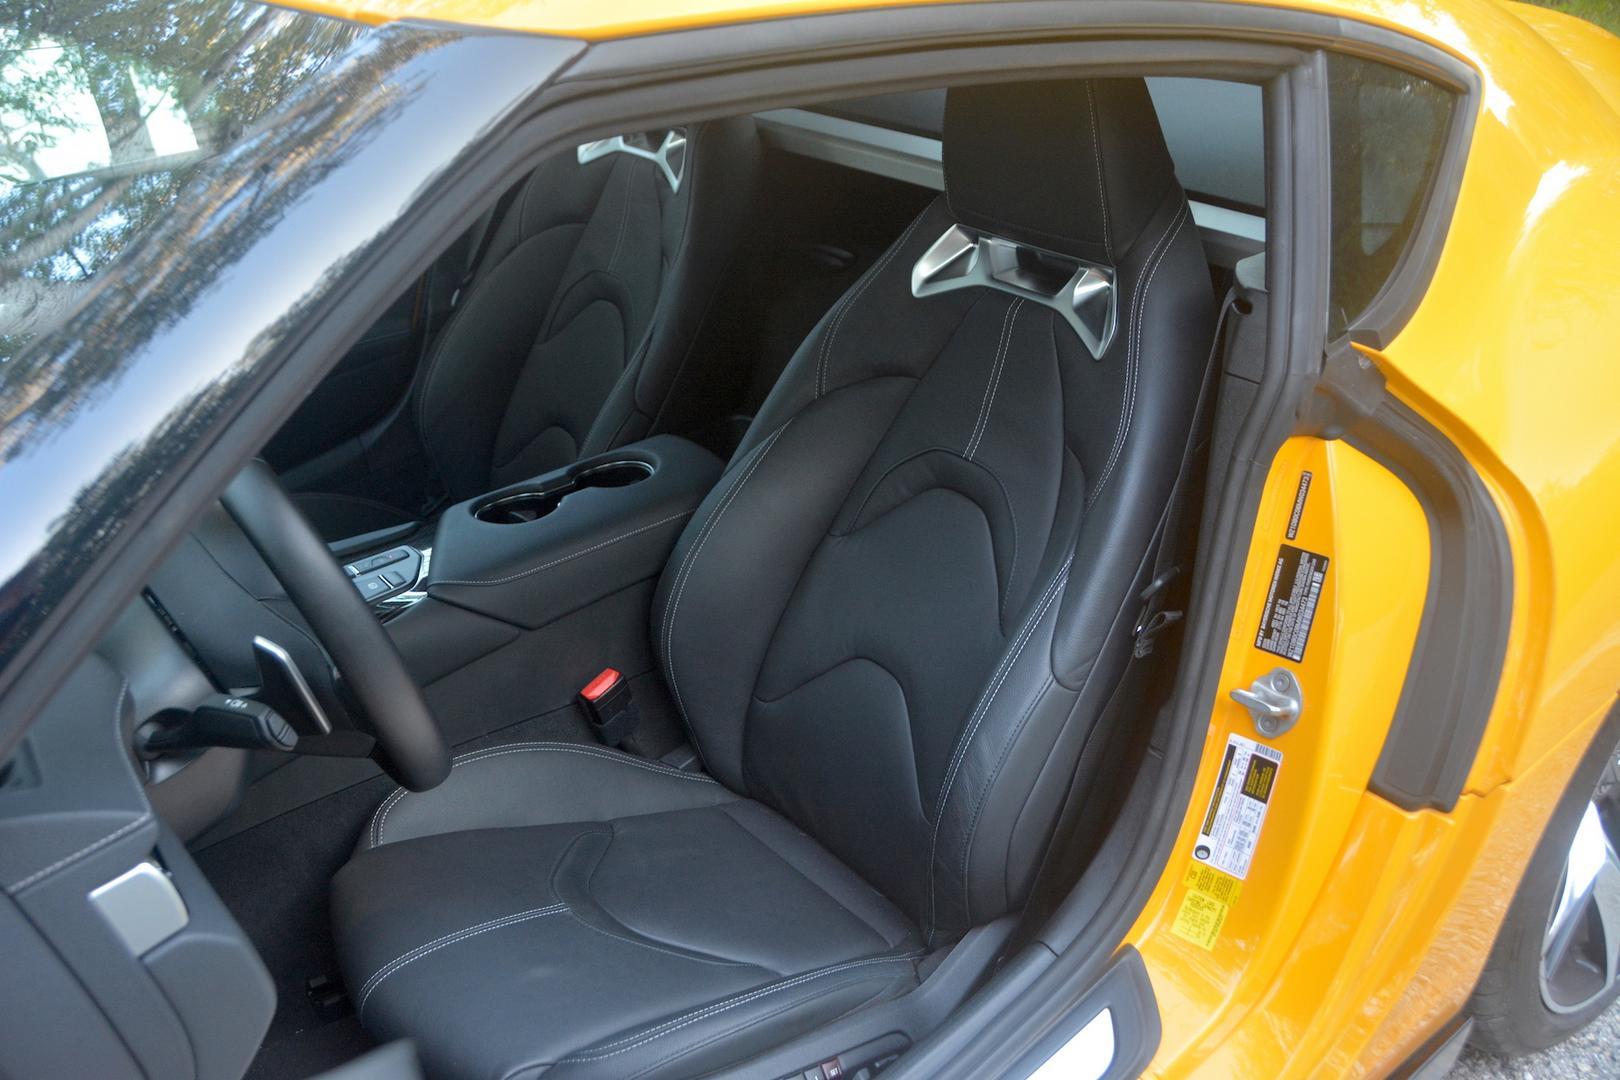 Toyota GR Supra seats